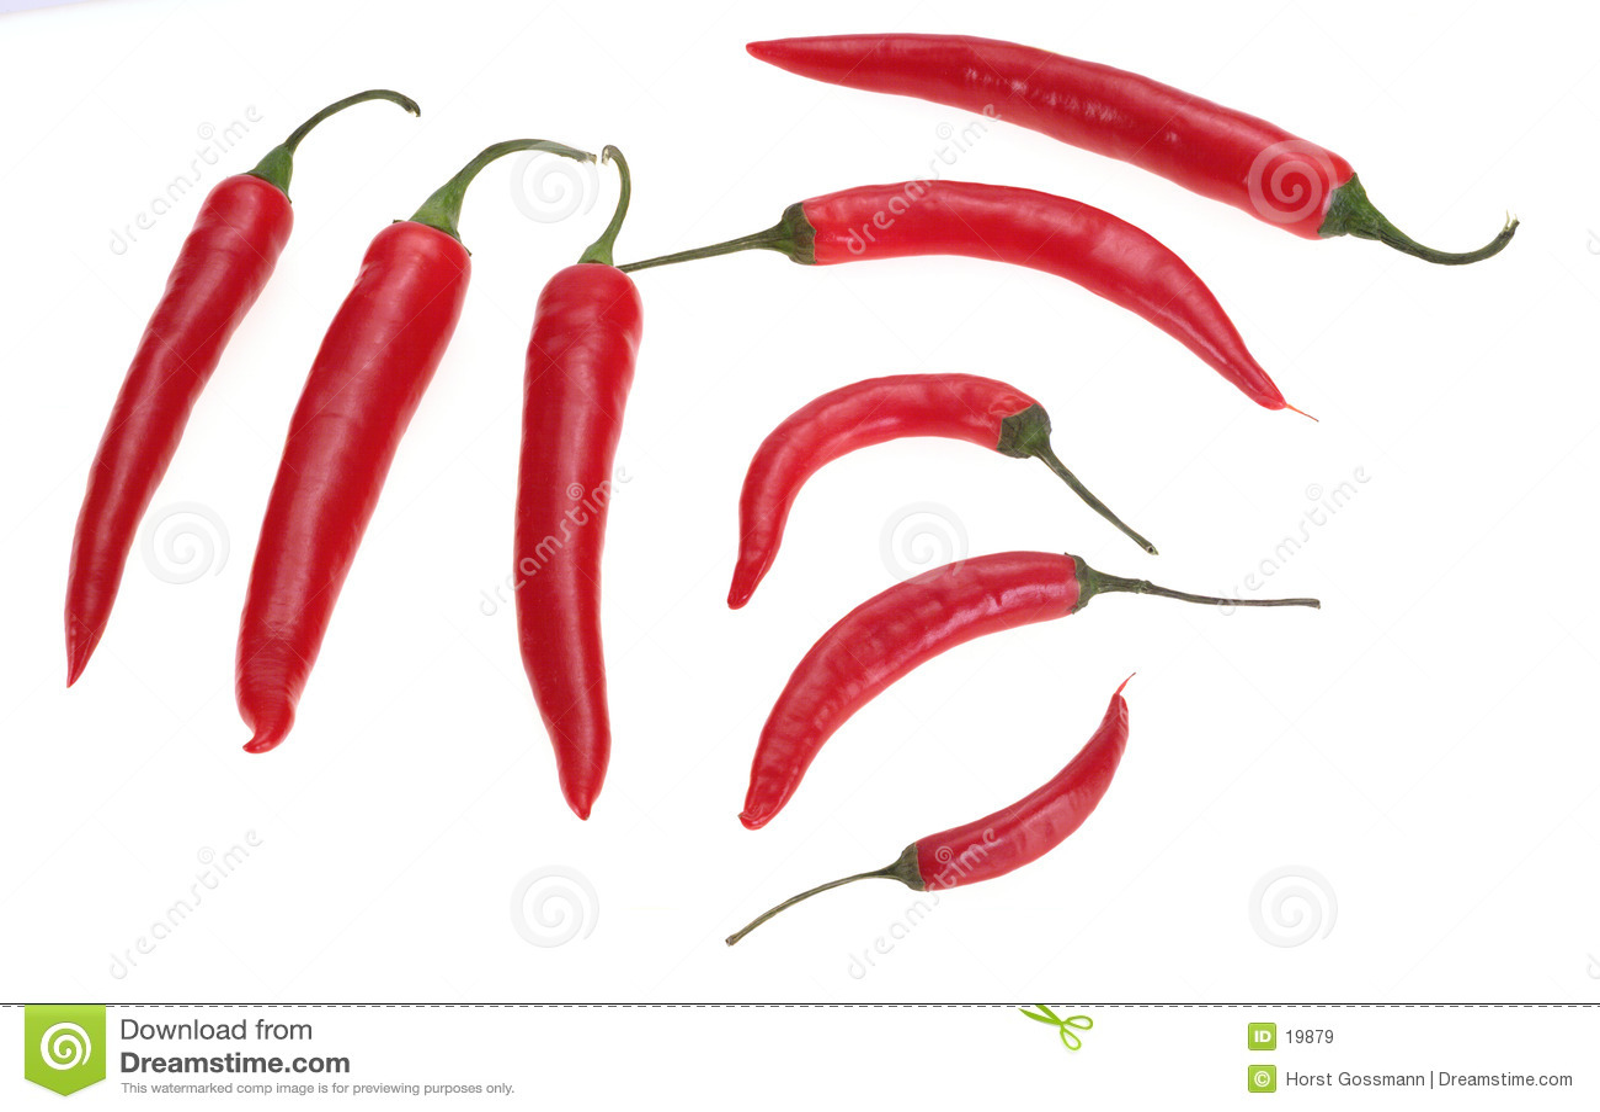 2 pepper